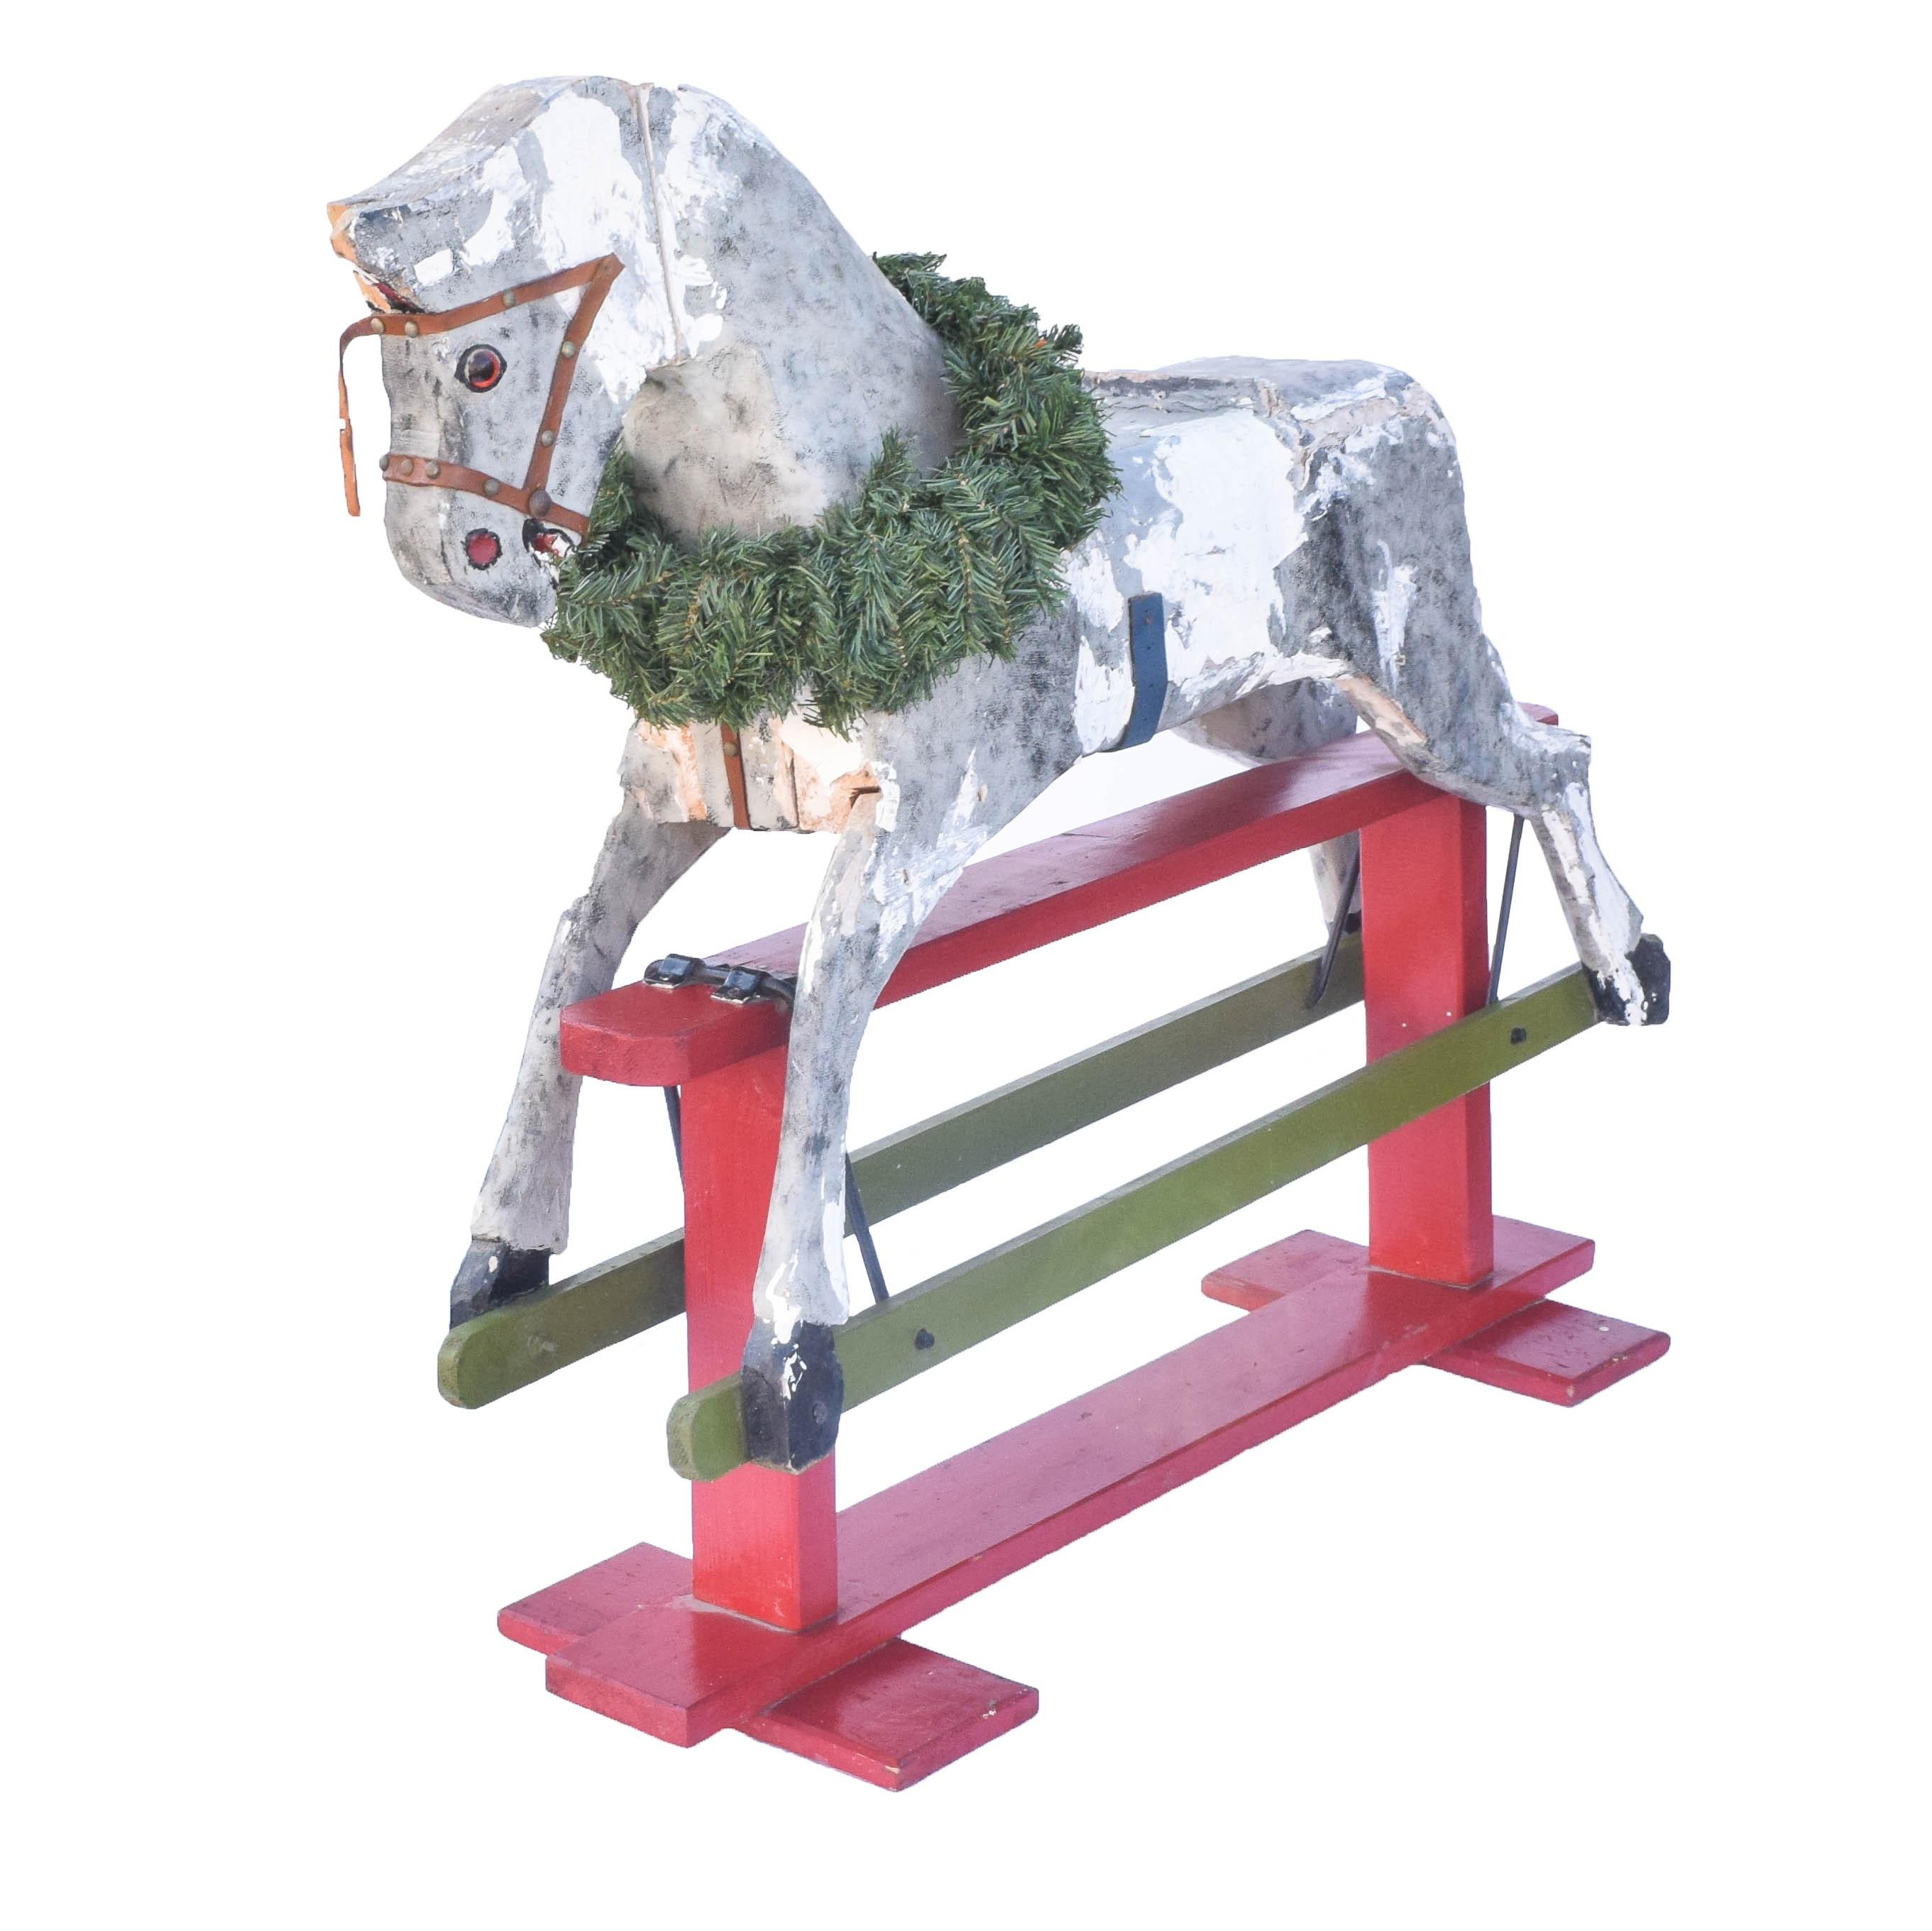 Vintage Wooden Rocking Horse Display